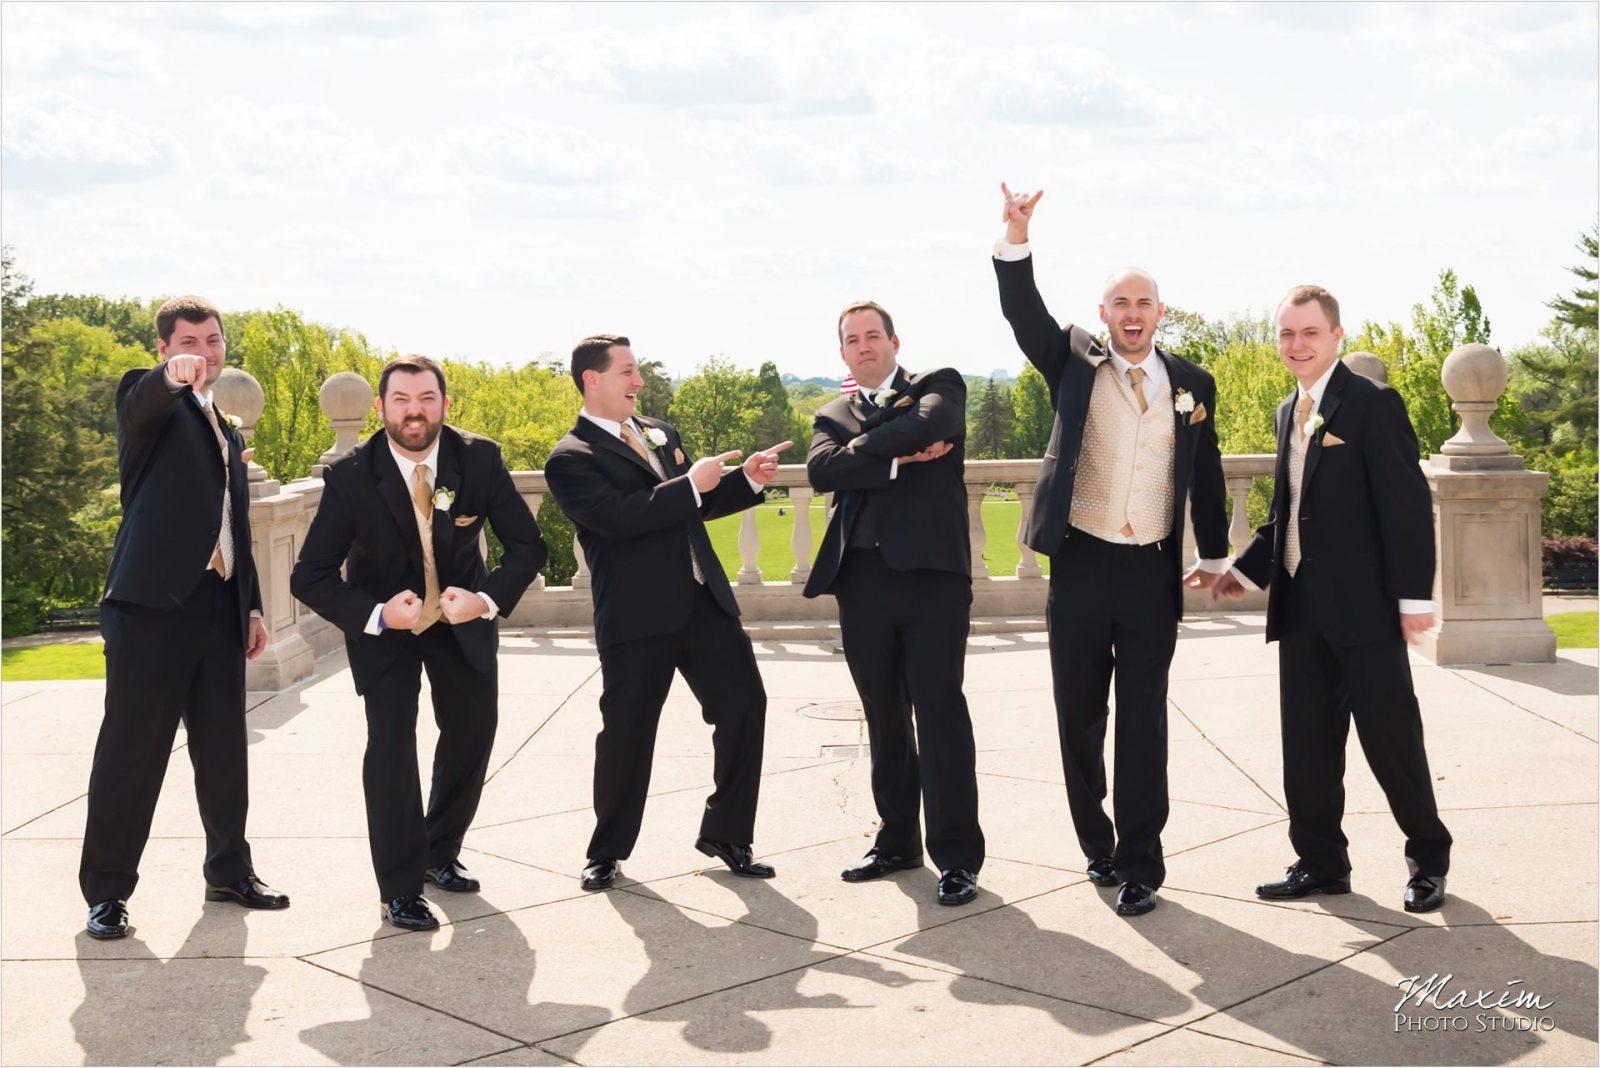 Ault Park Cincinnati Wedding Groomsmen